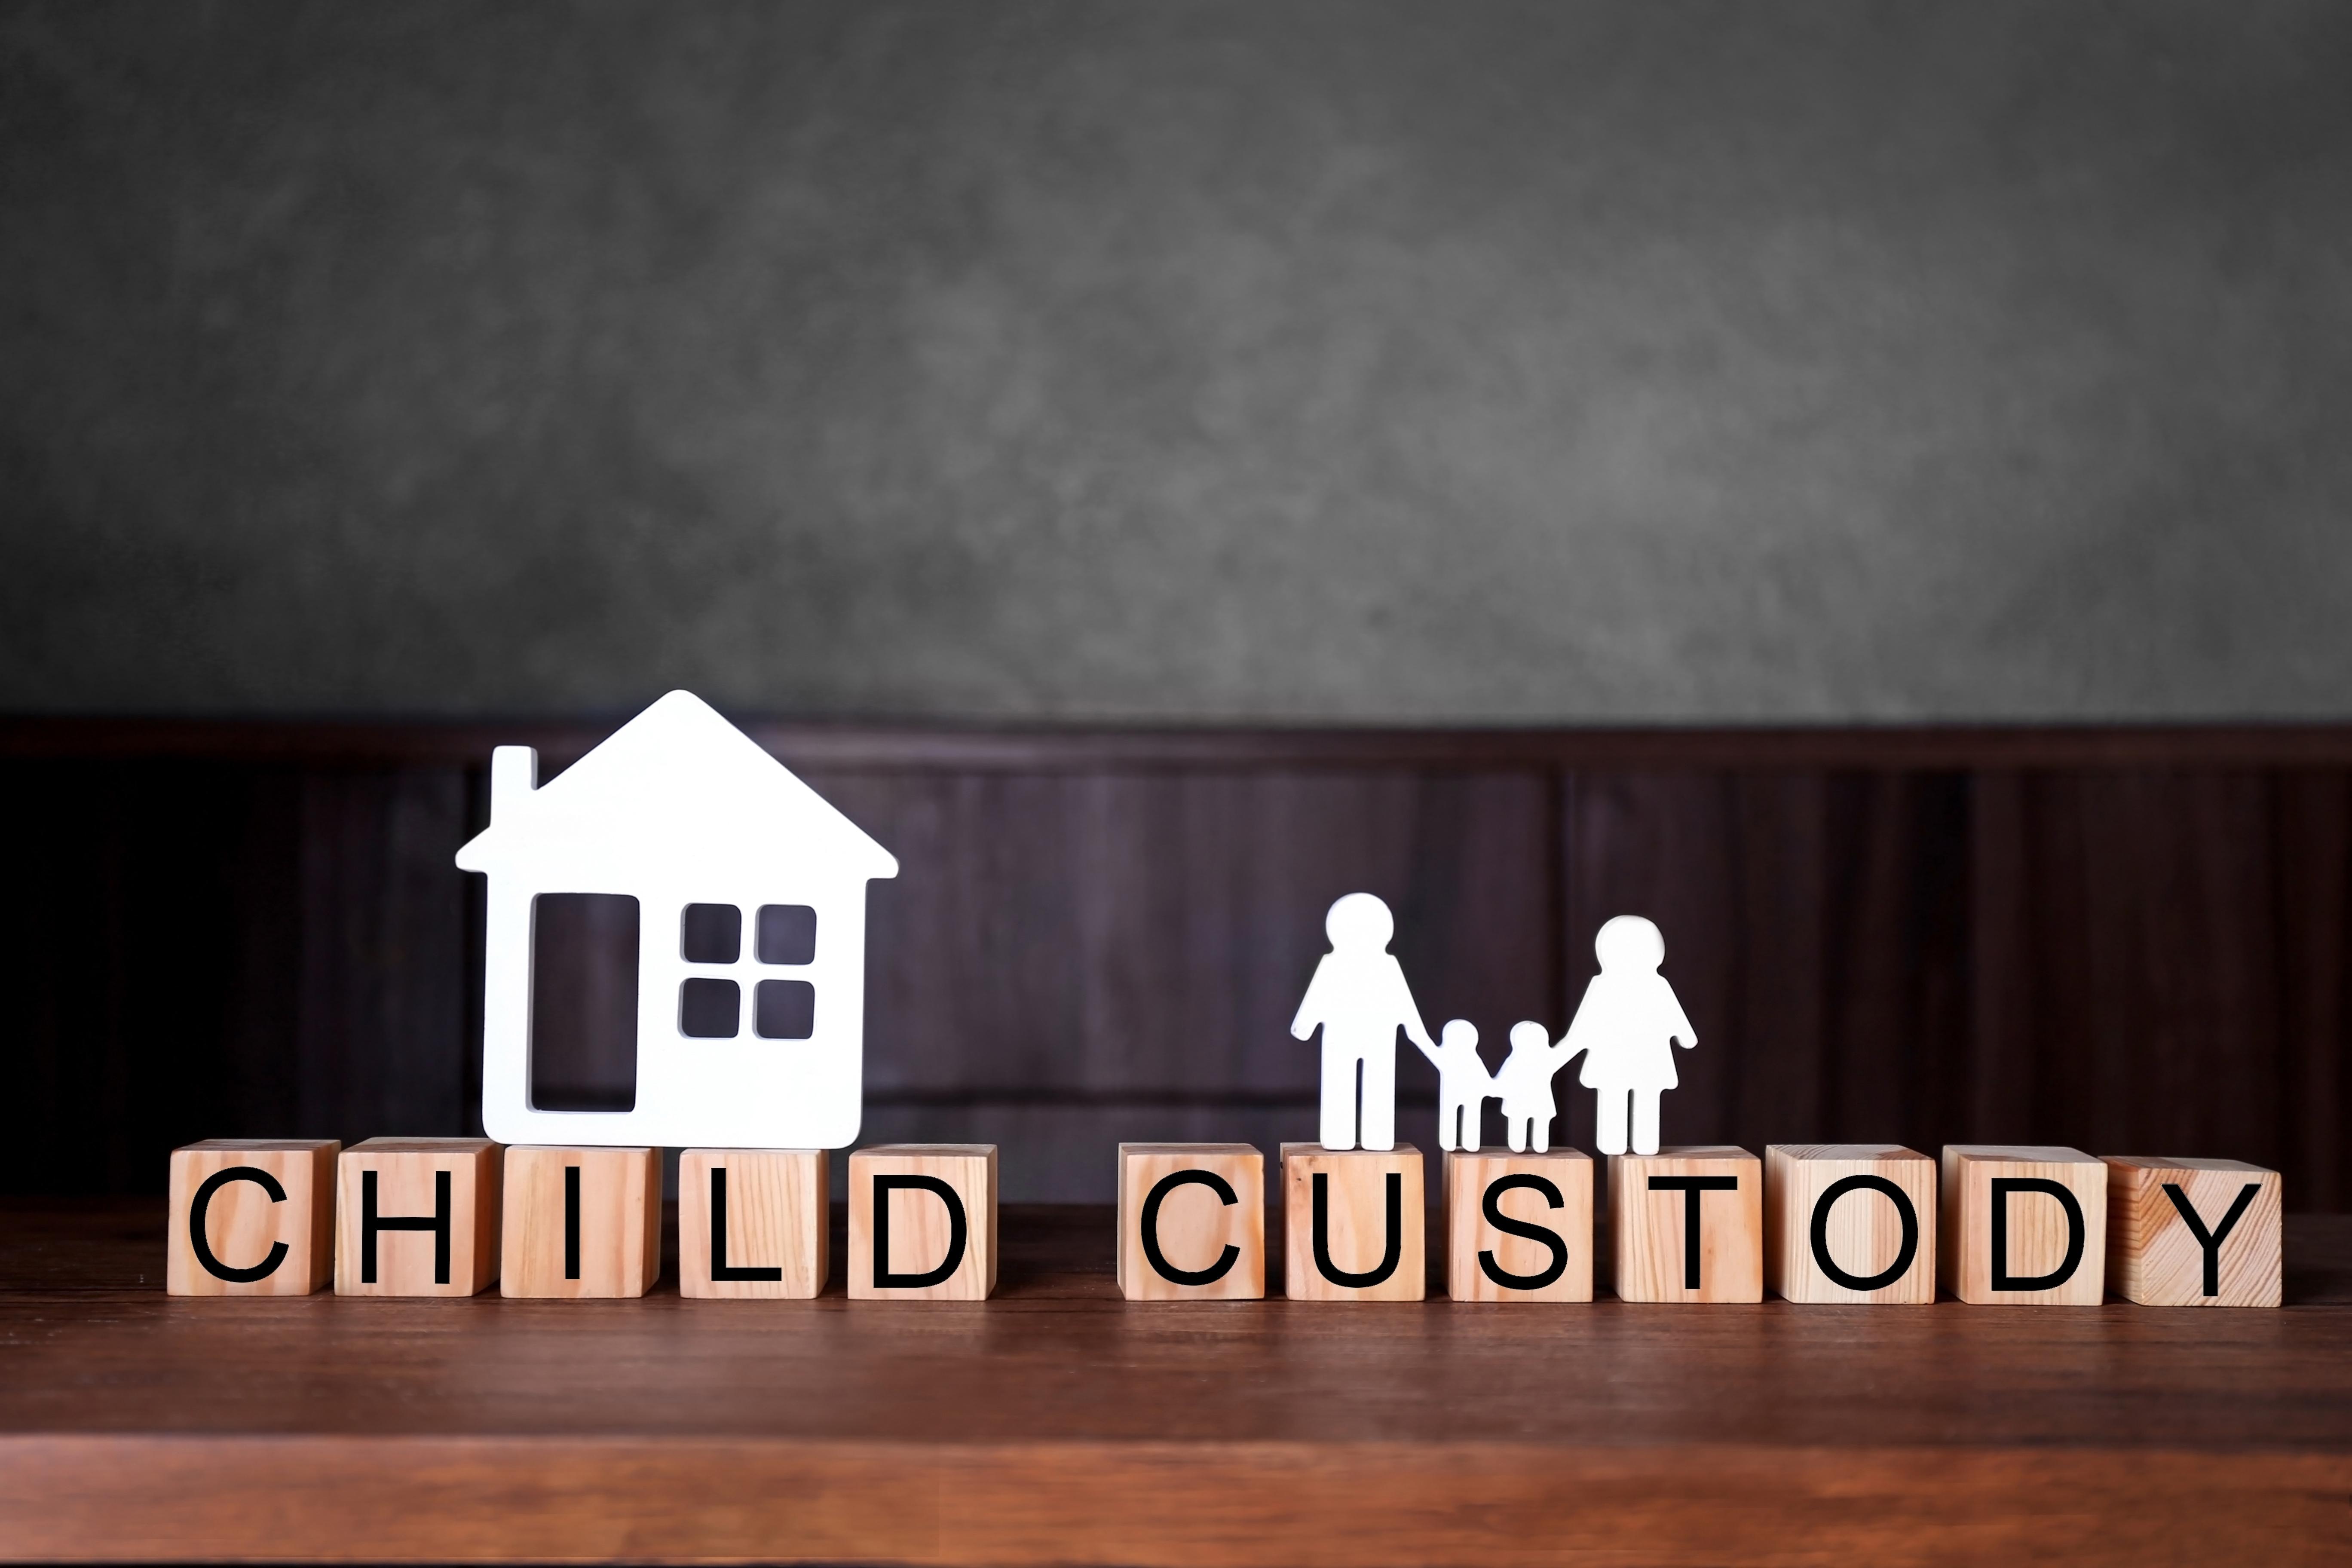 Ohio Child Custody Laws, Child Custody